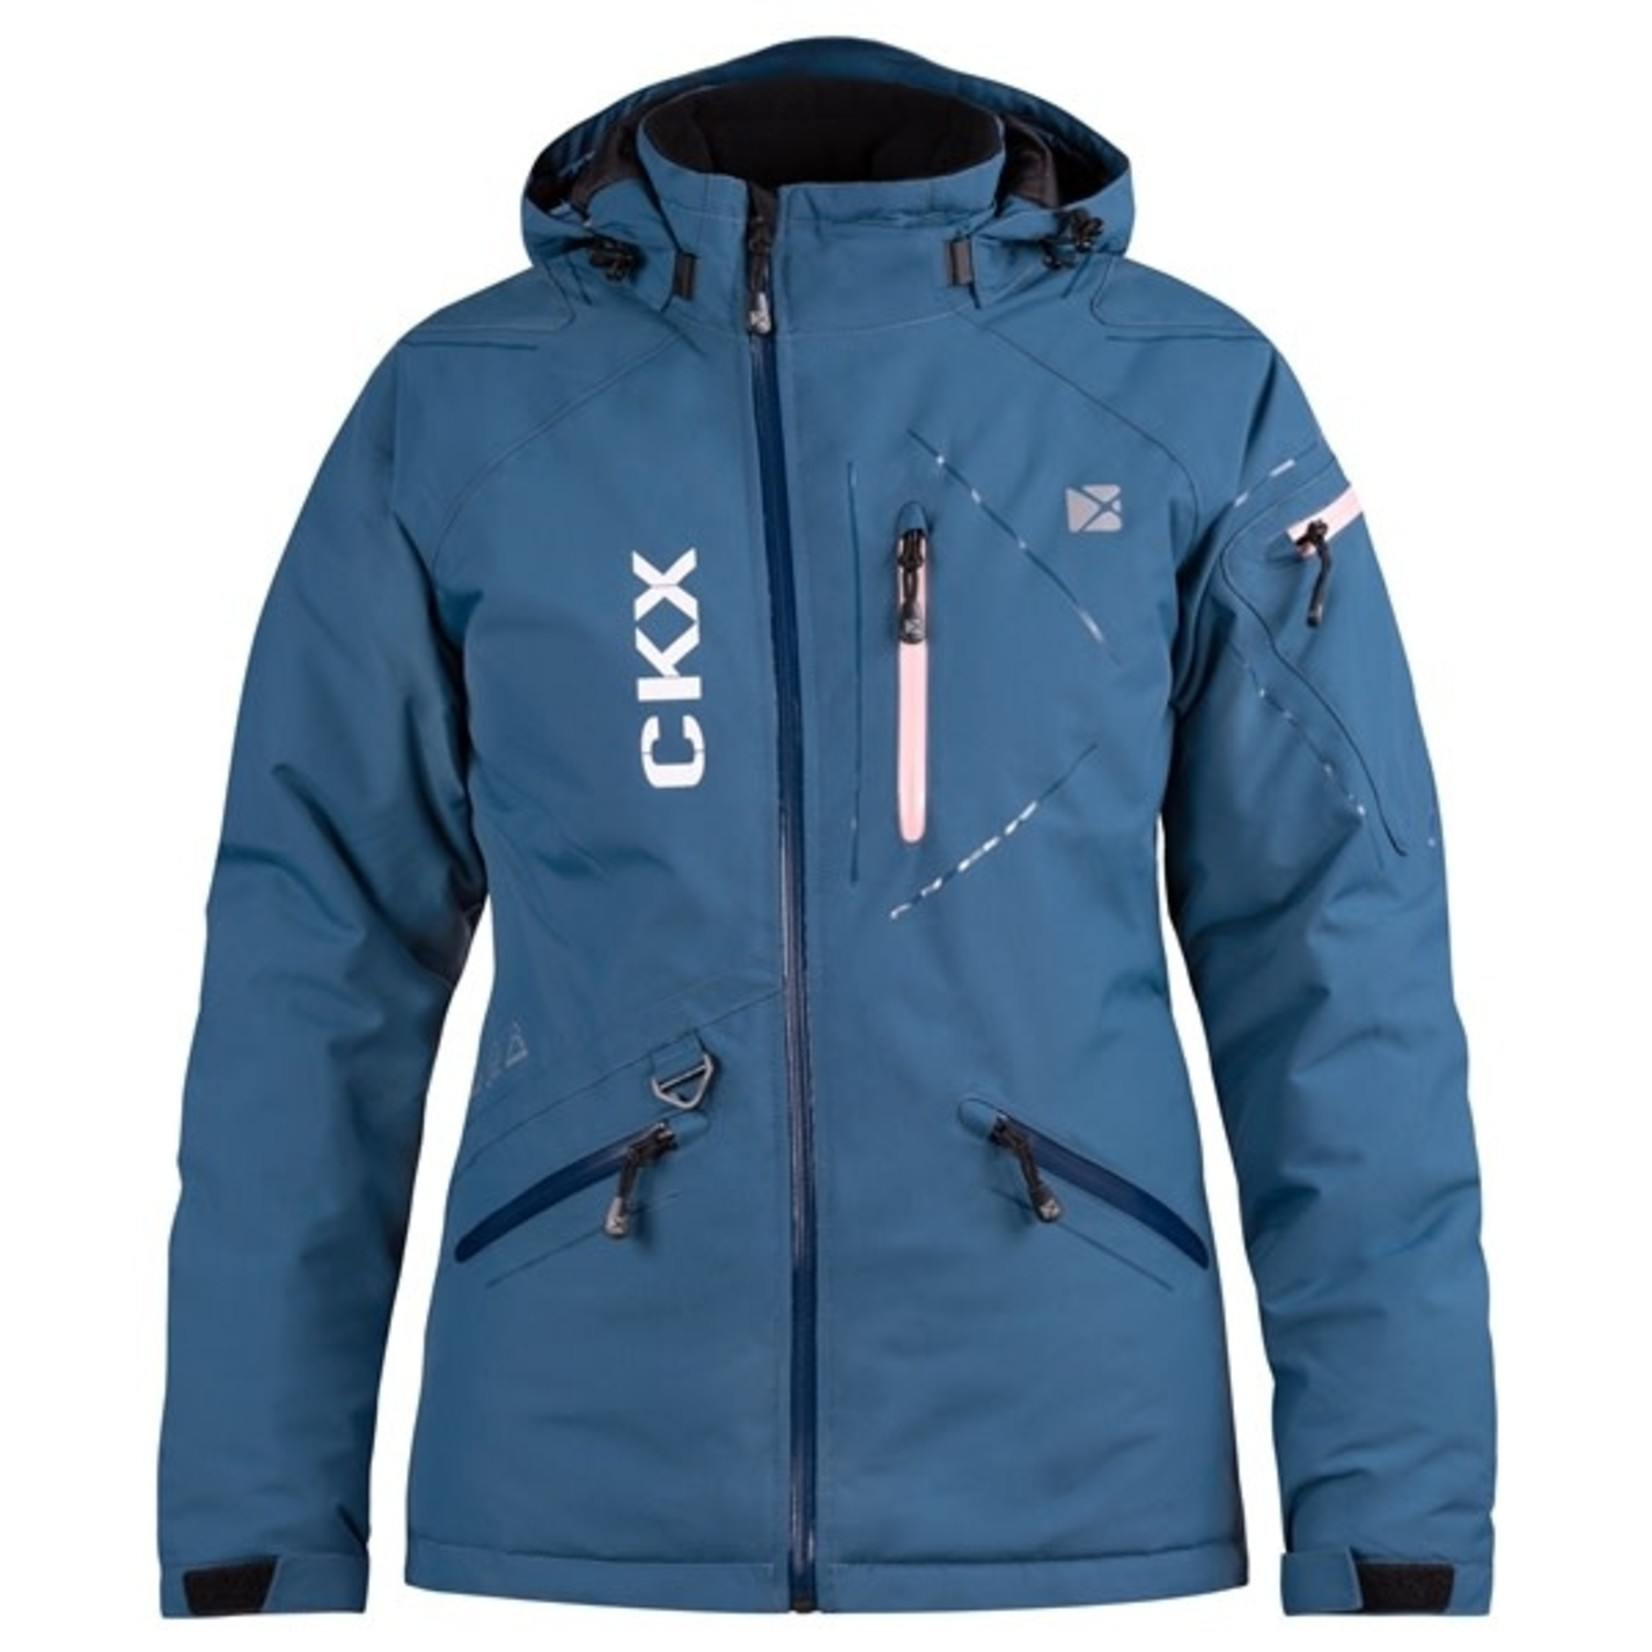 CKX CKX Women's Alaska Jacket - Blue